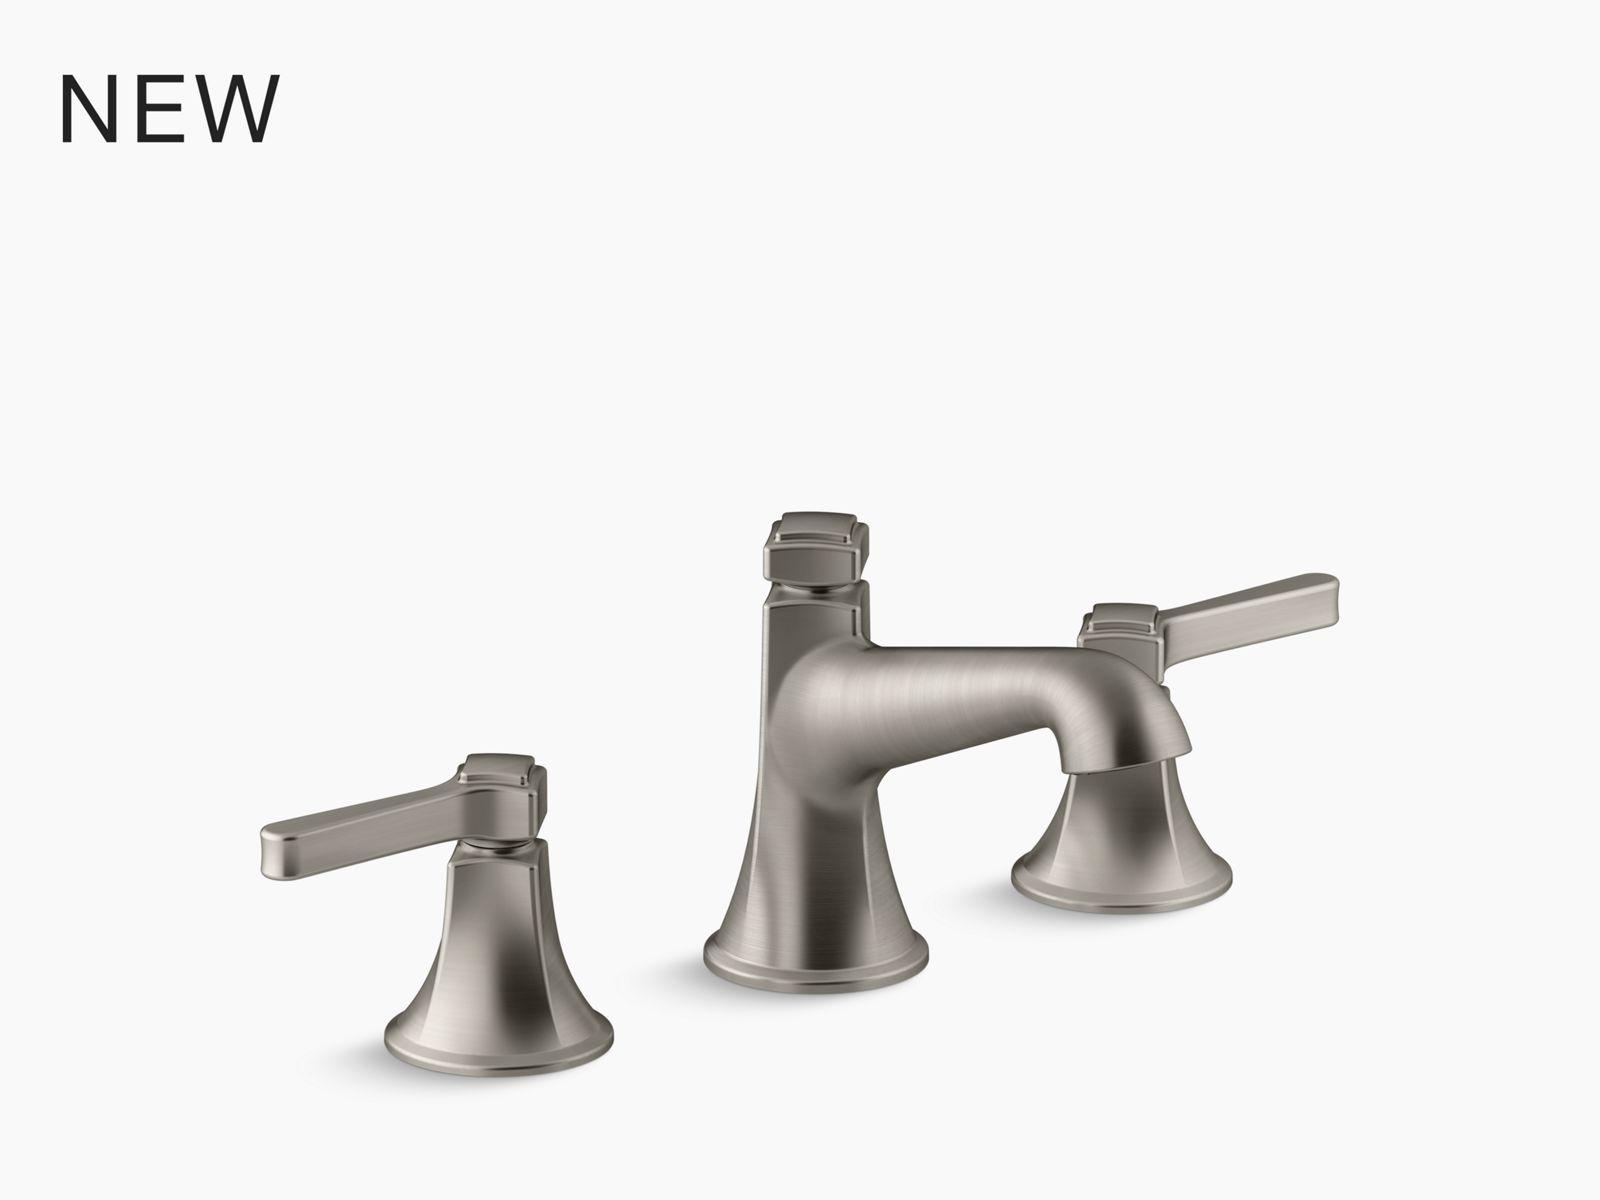 ladena 23 1 4 x 16 1 4 x 8 1 8 undermount bathroom sink